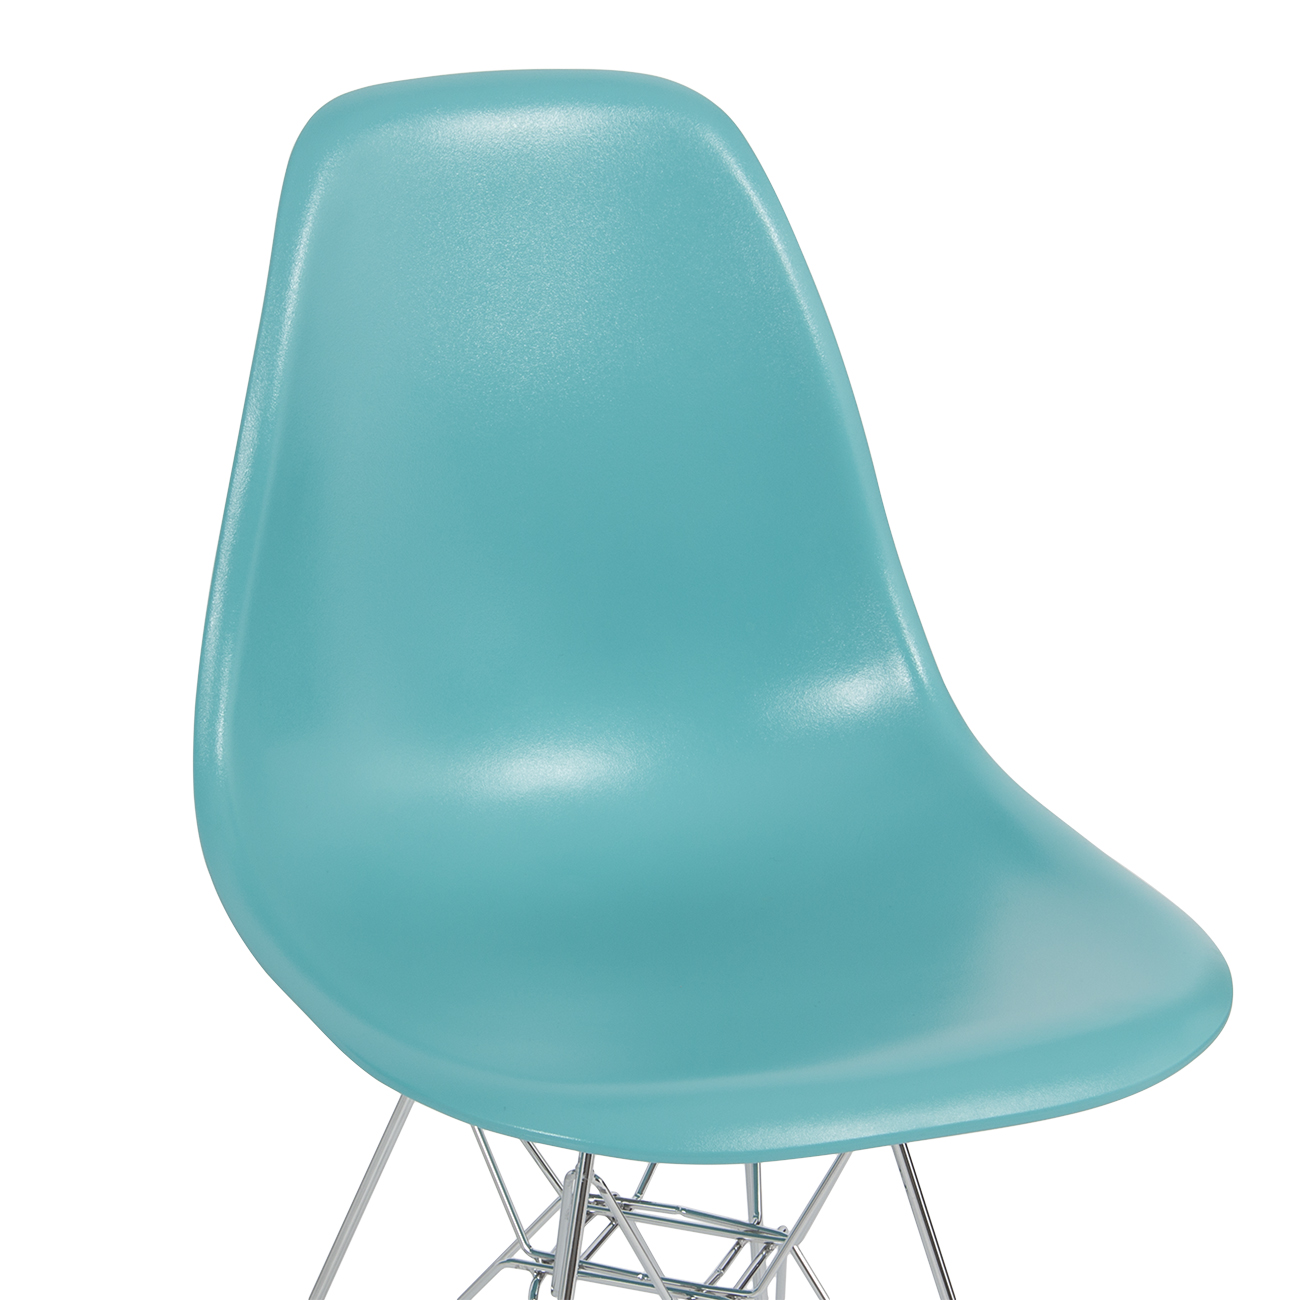 2x Eames Style DSW Modern Eiffel Side Chair Molded ABS  : 014 hg 14089 bl4 from www.ebay.com size 1300 x 1300 jpeg 527kB